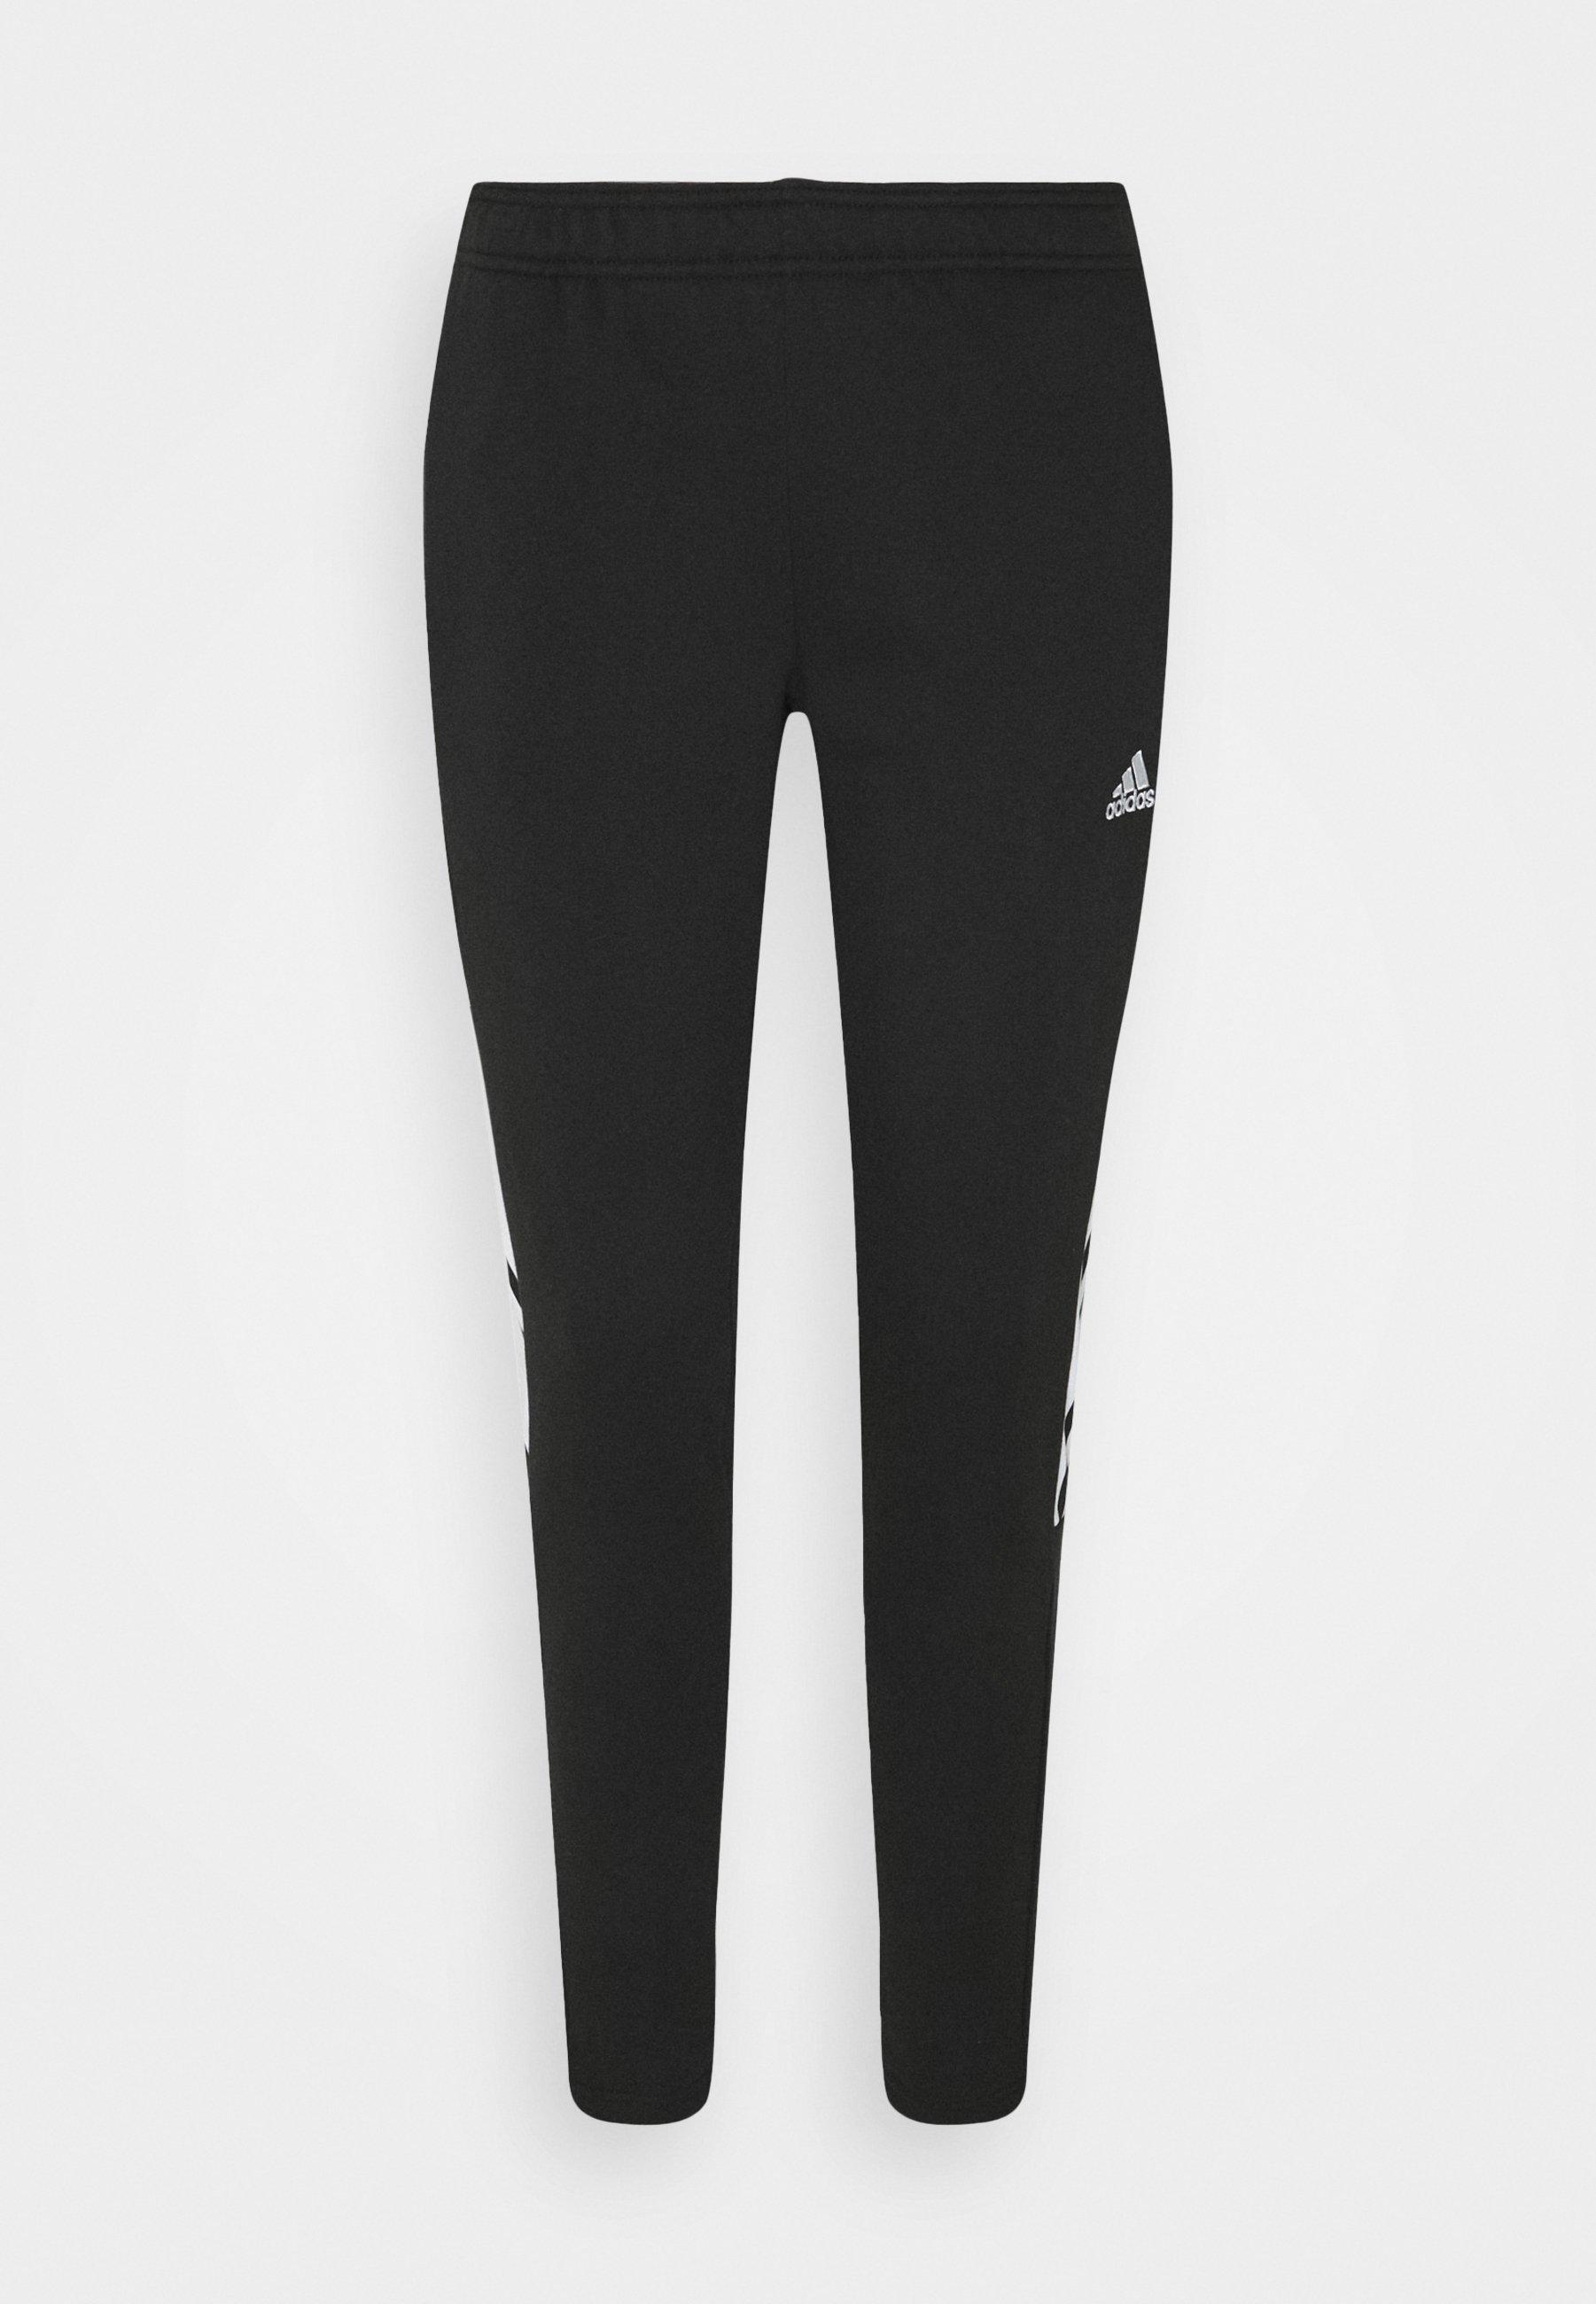 Damen TIRO21 FOOTBALL WOMEN PANTS - Jogginghose